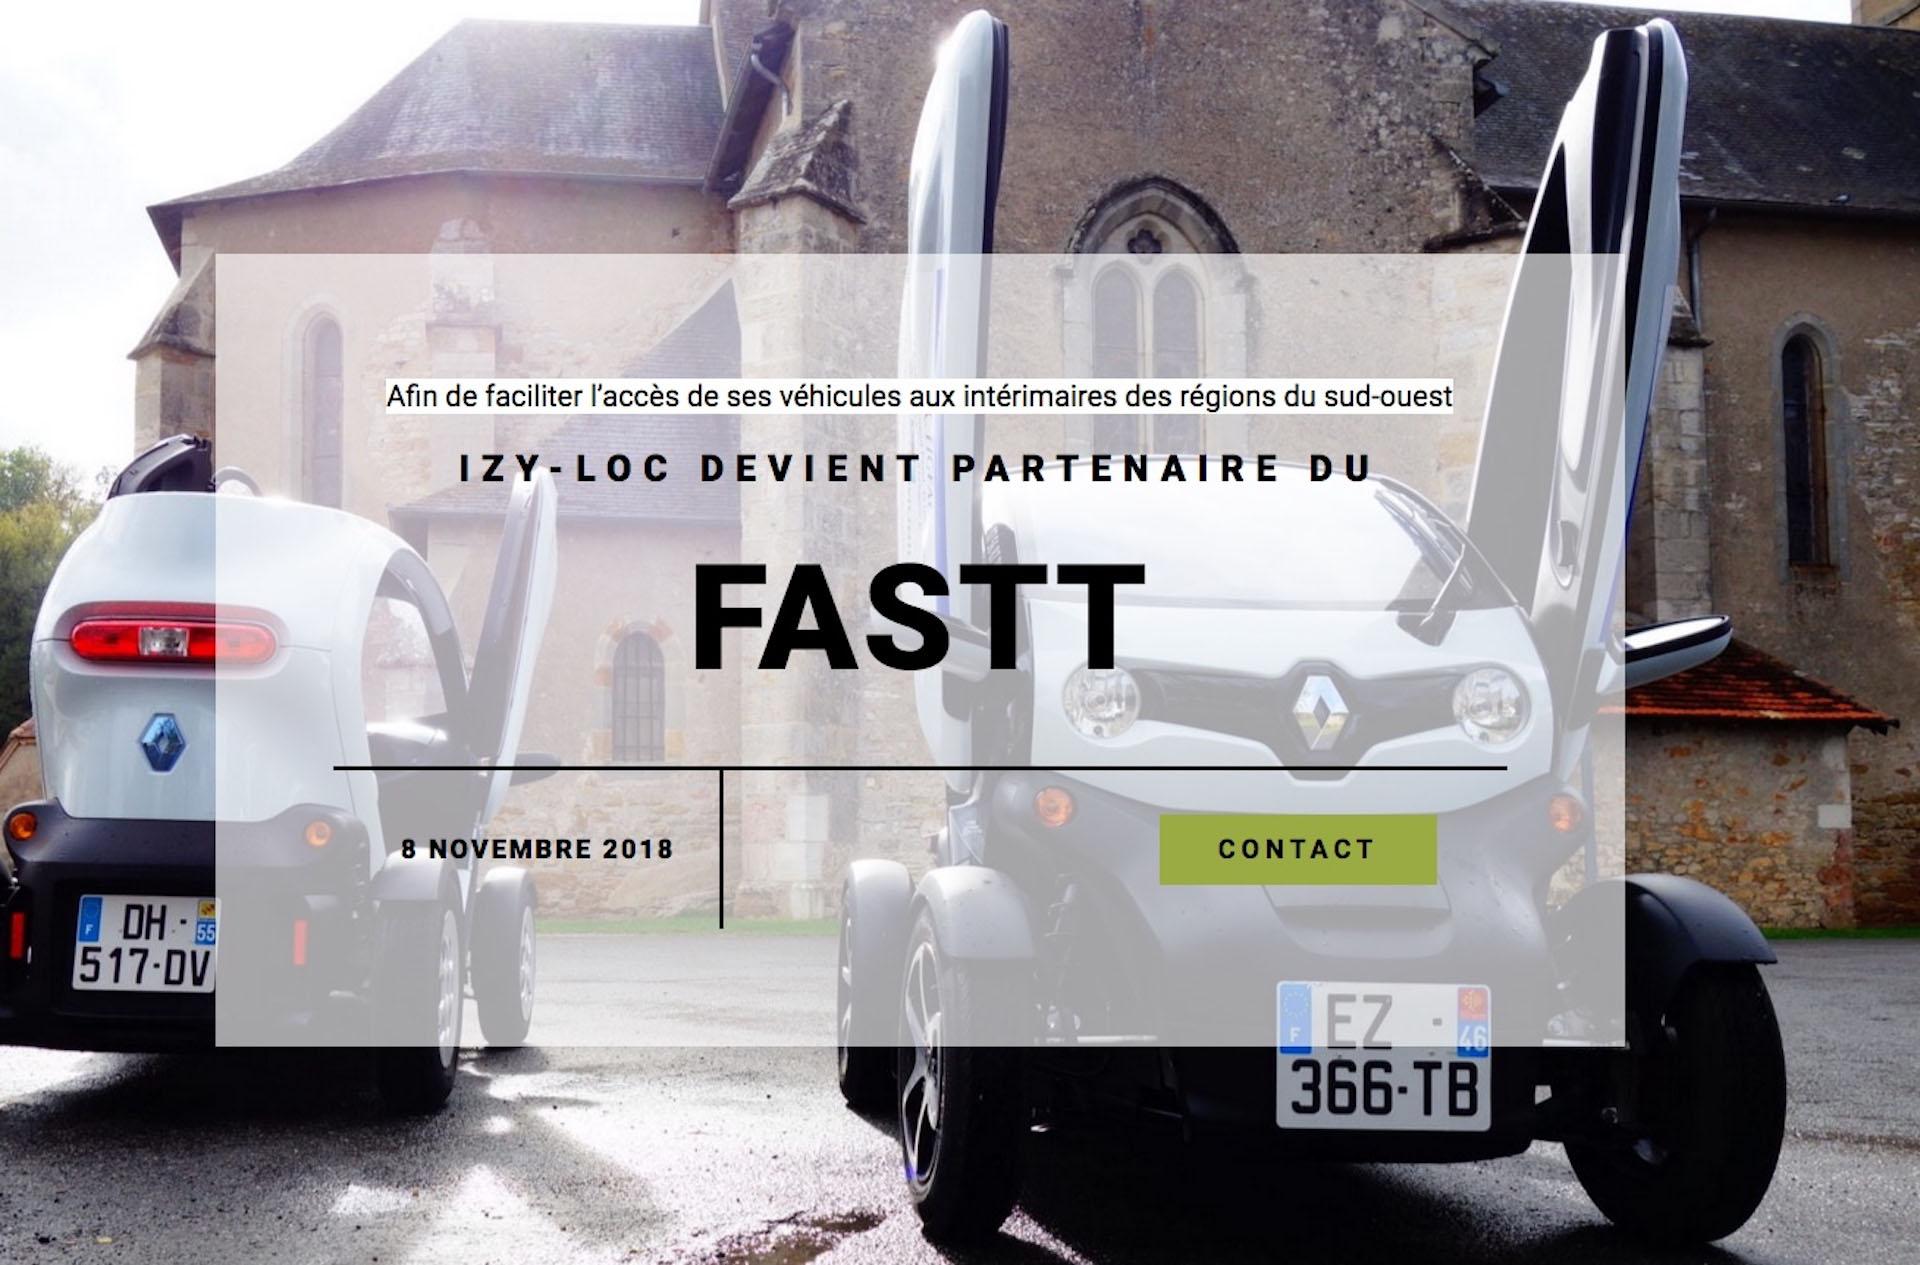 Partenariat IZY-LOC avec le FASTT